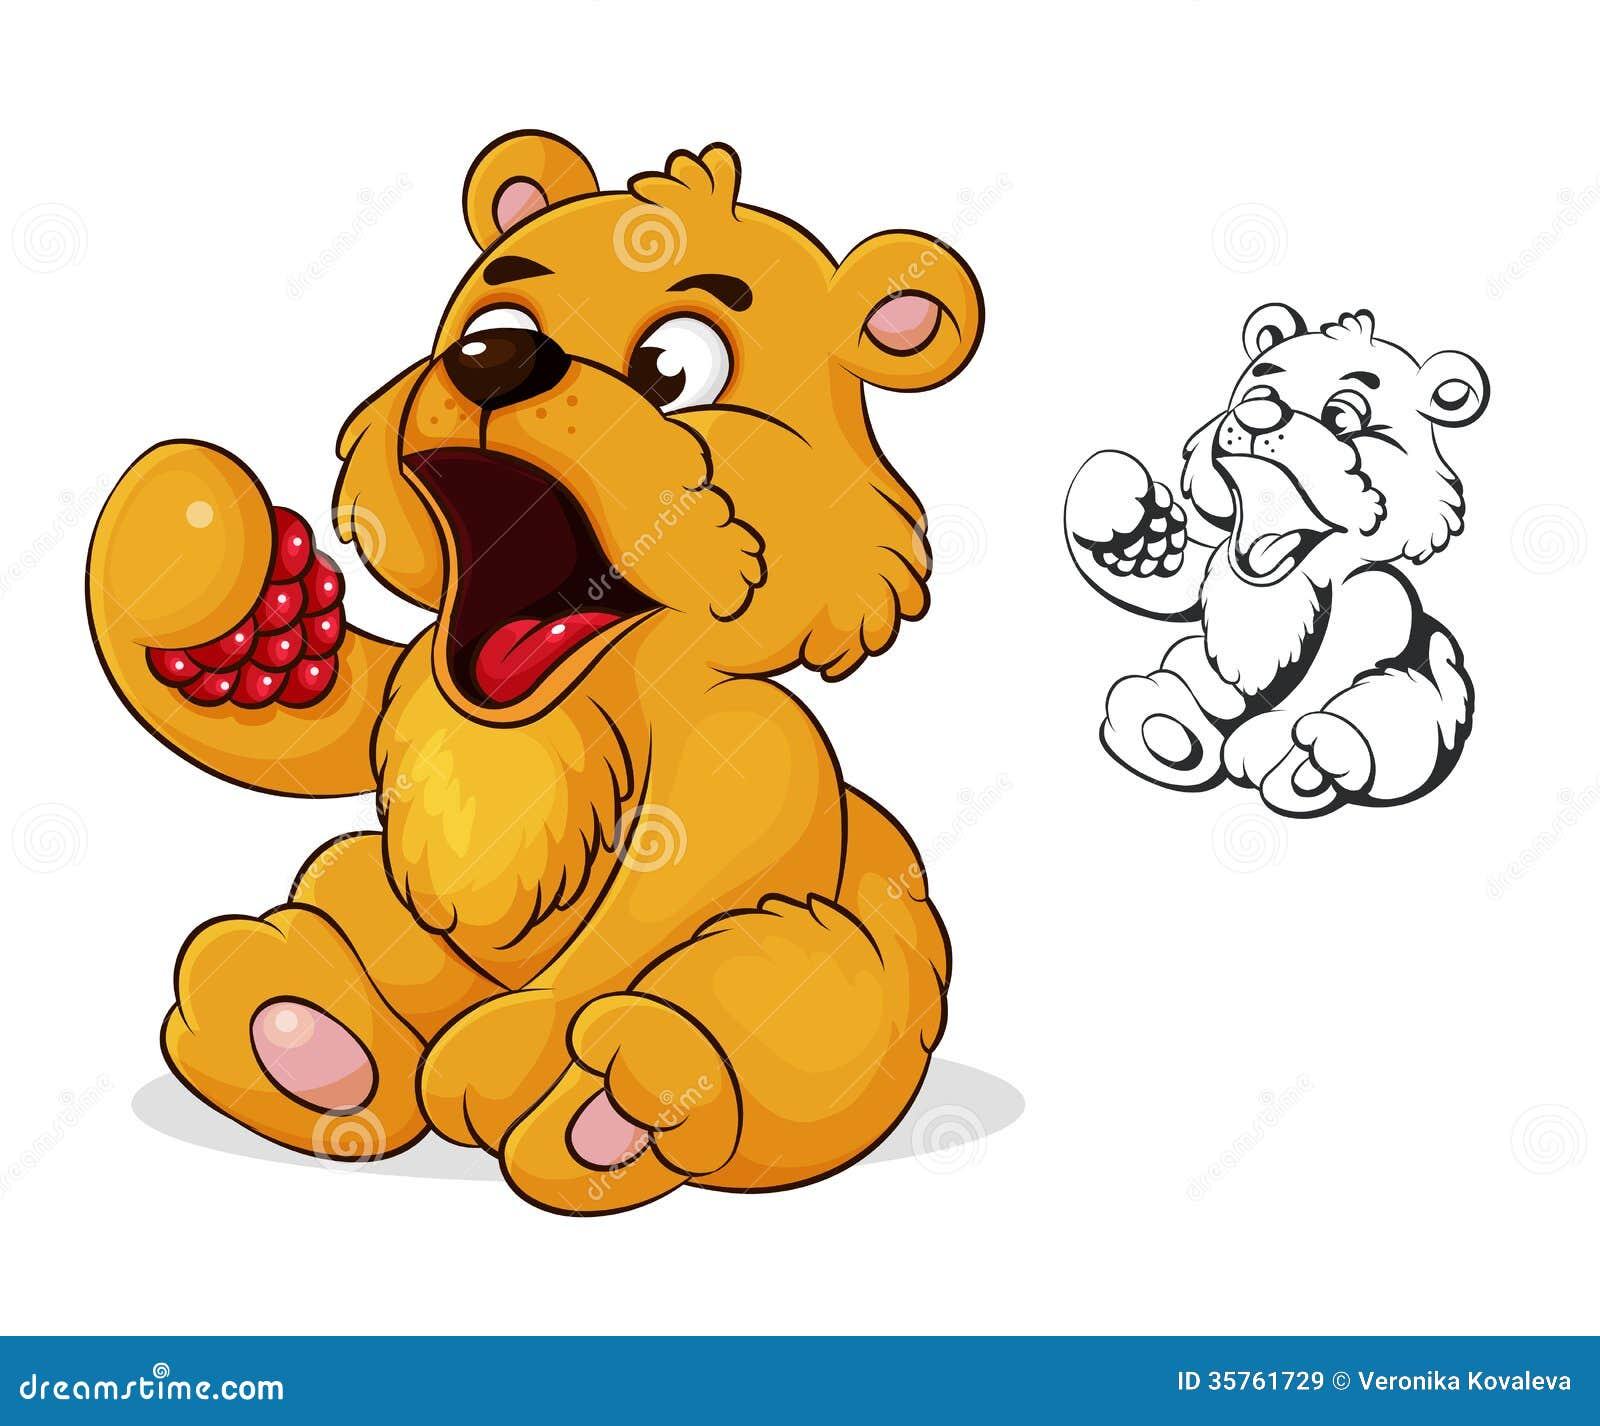 teddy bear eats raspberries royalty free stock images Teddy Bear Baby Cub Black Bear Cubs